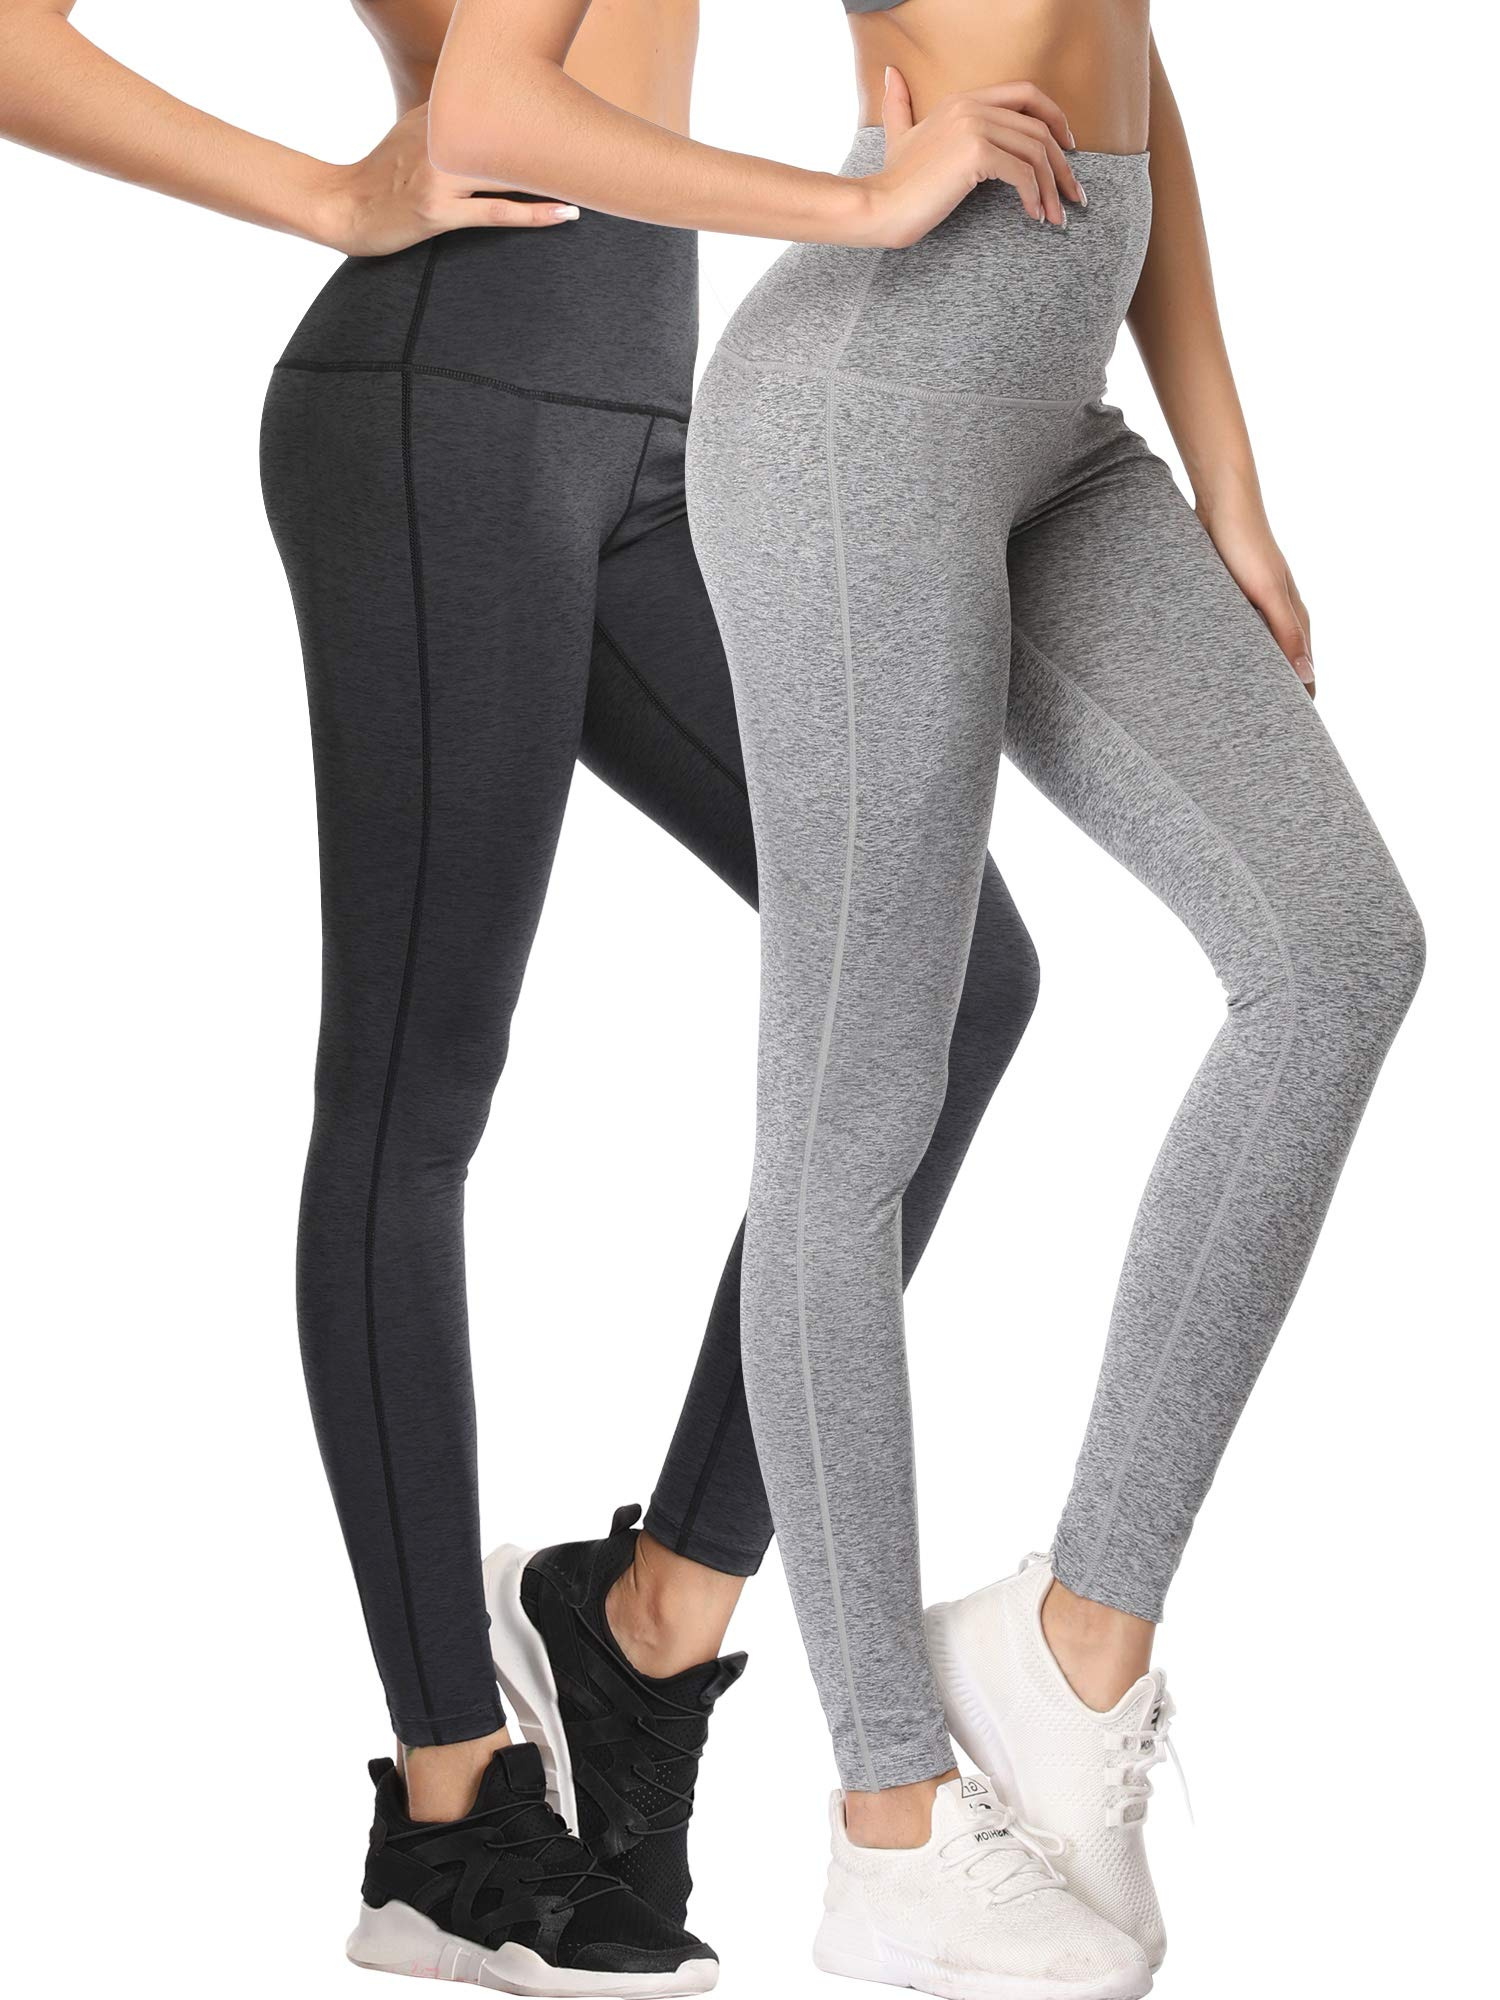 Cadmus Tummy Control Workout Leggings for Yoga Womens,1101,Dark Grey & Gray,Small